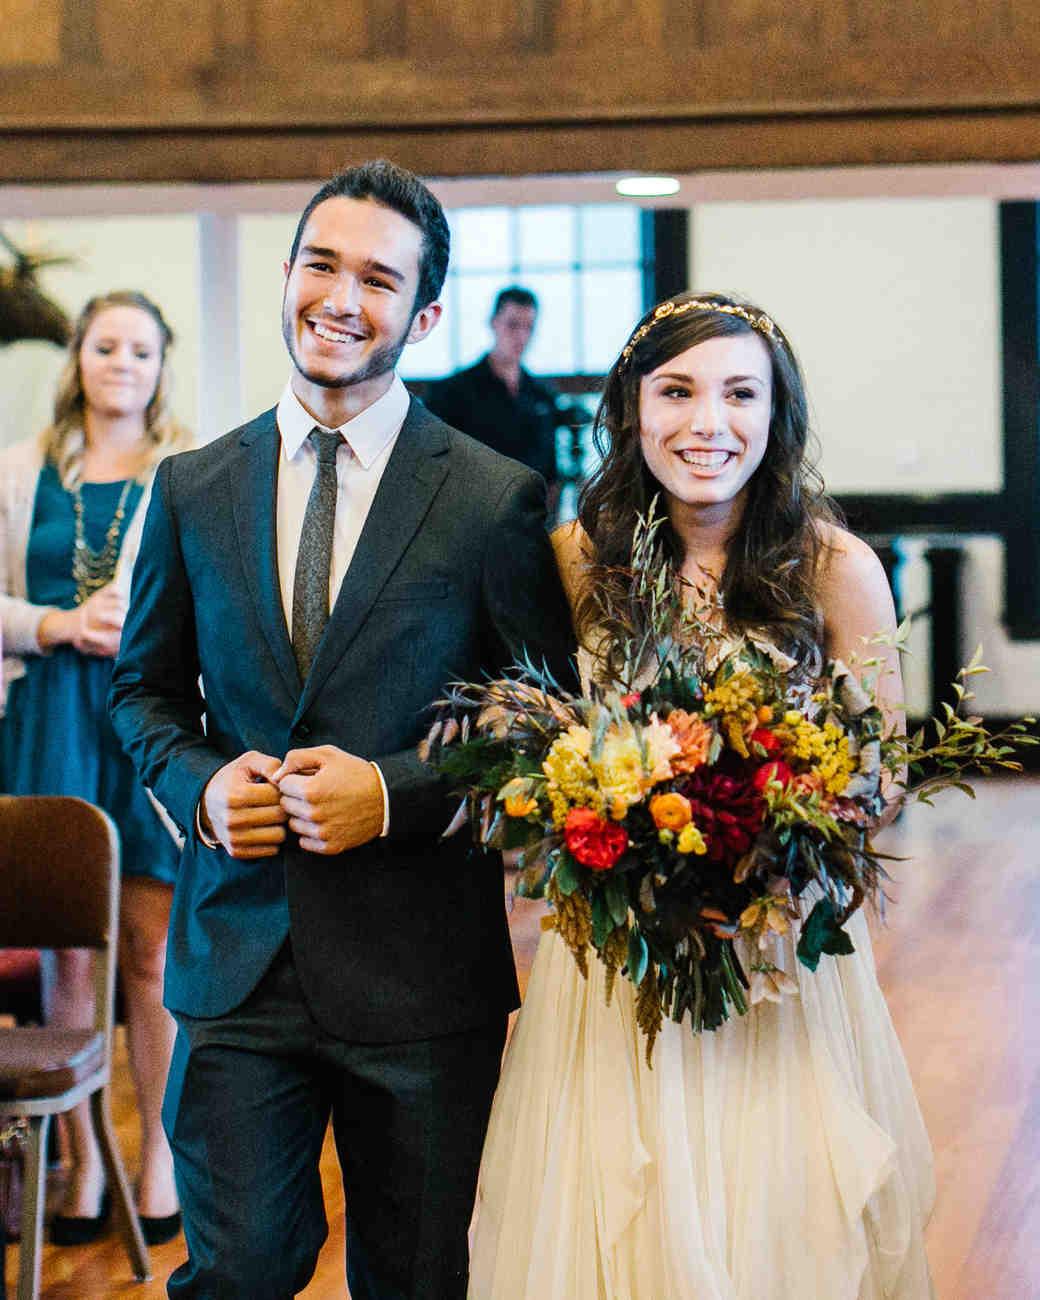 marguerita-aaron-wedding-processional-322-s111848-0214.jpg